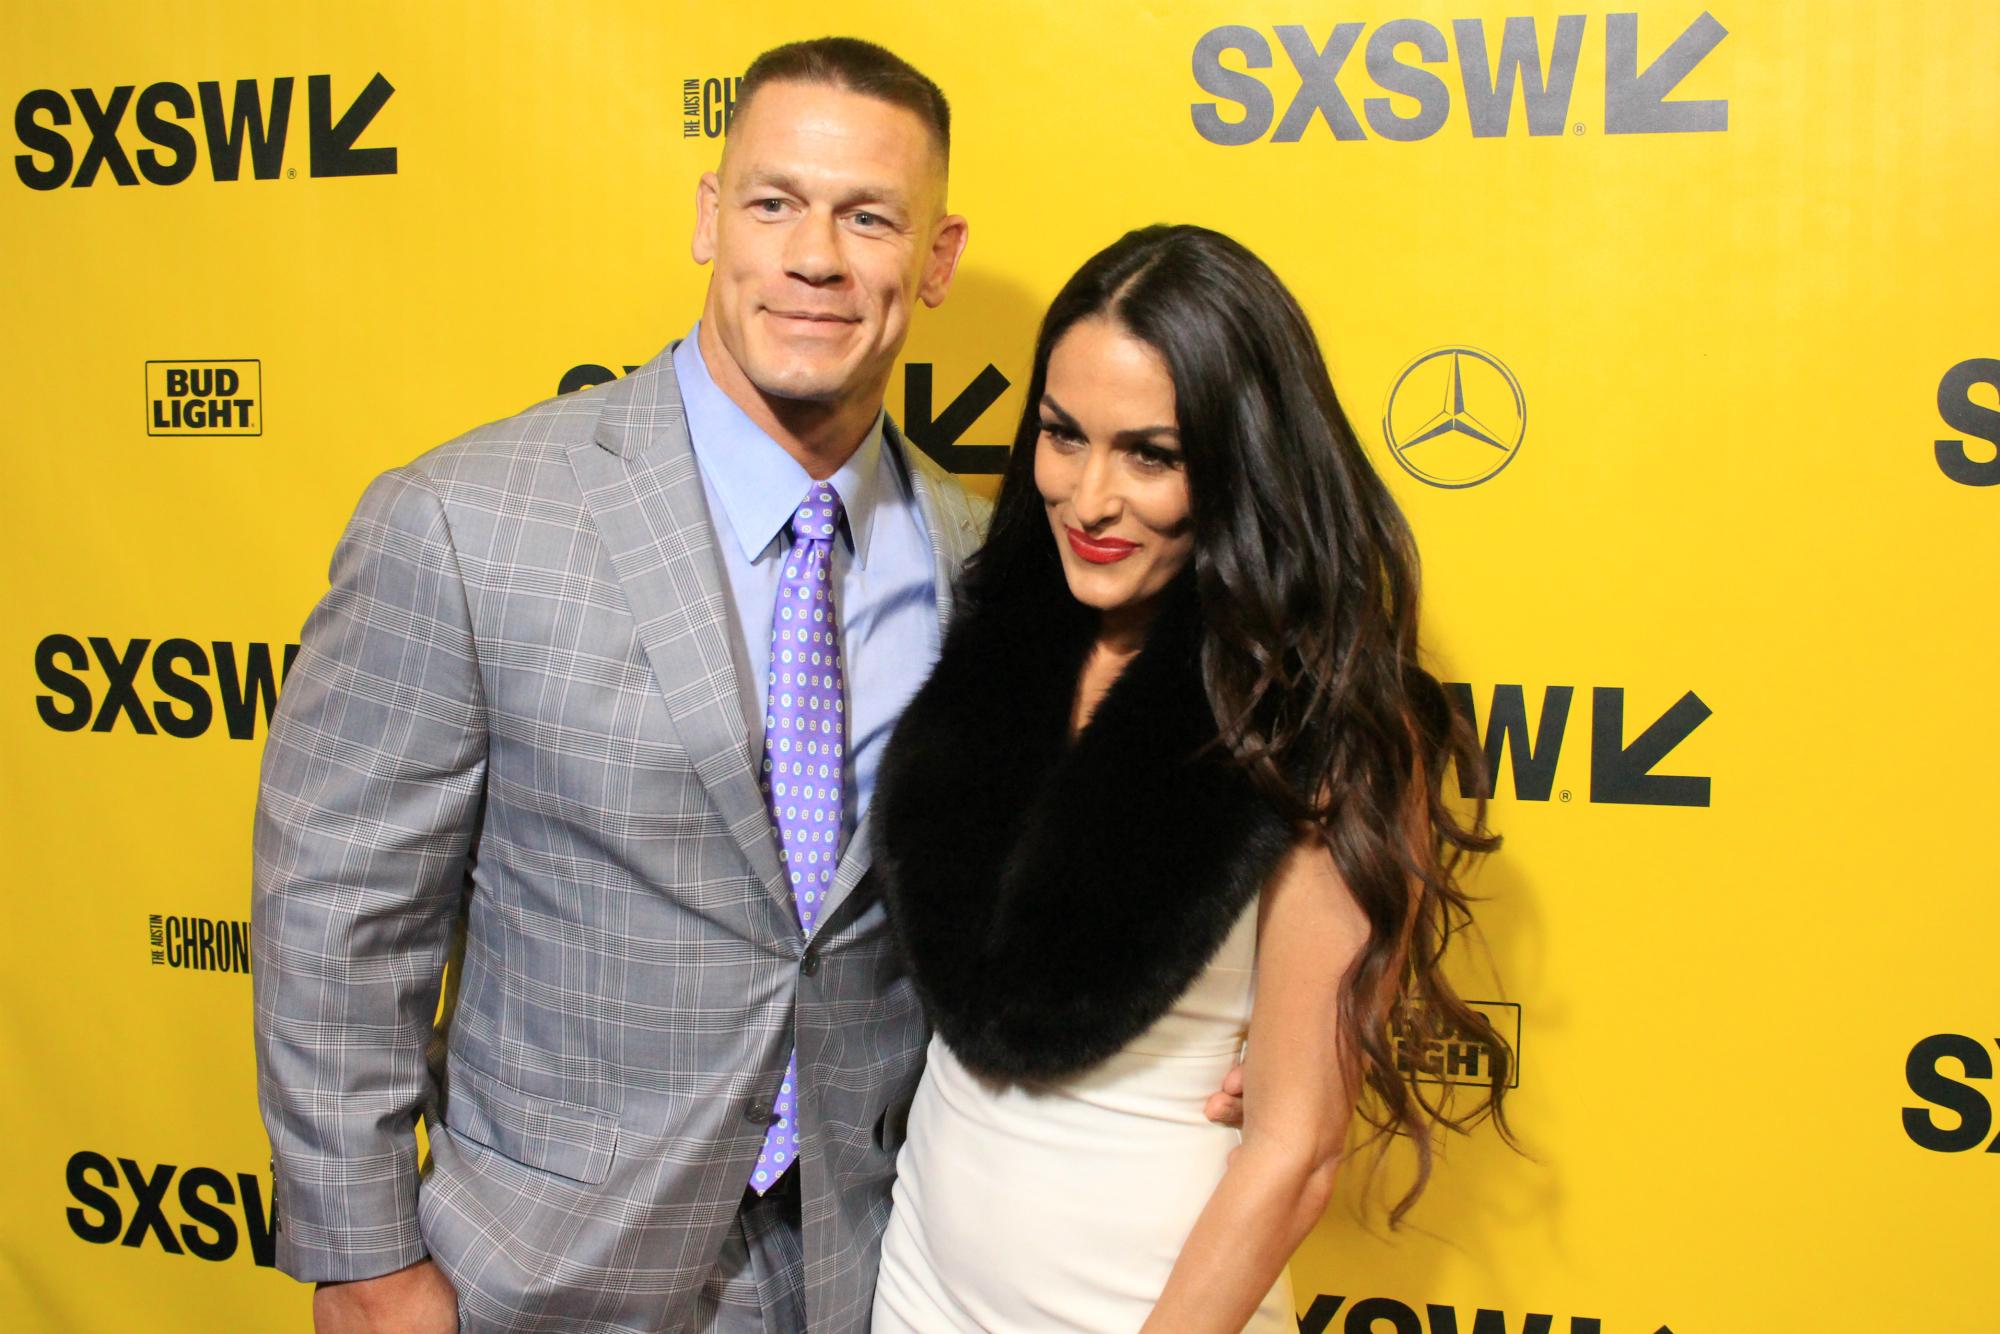 John Cena and Nikki Bella // Blockers, photo by Heather Kaplan